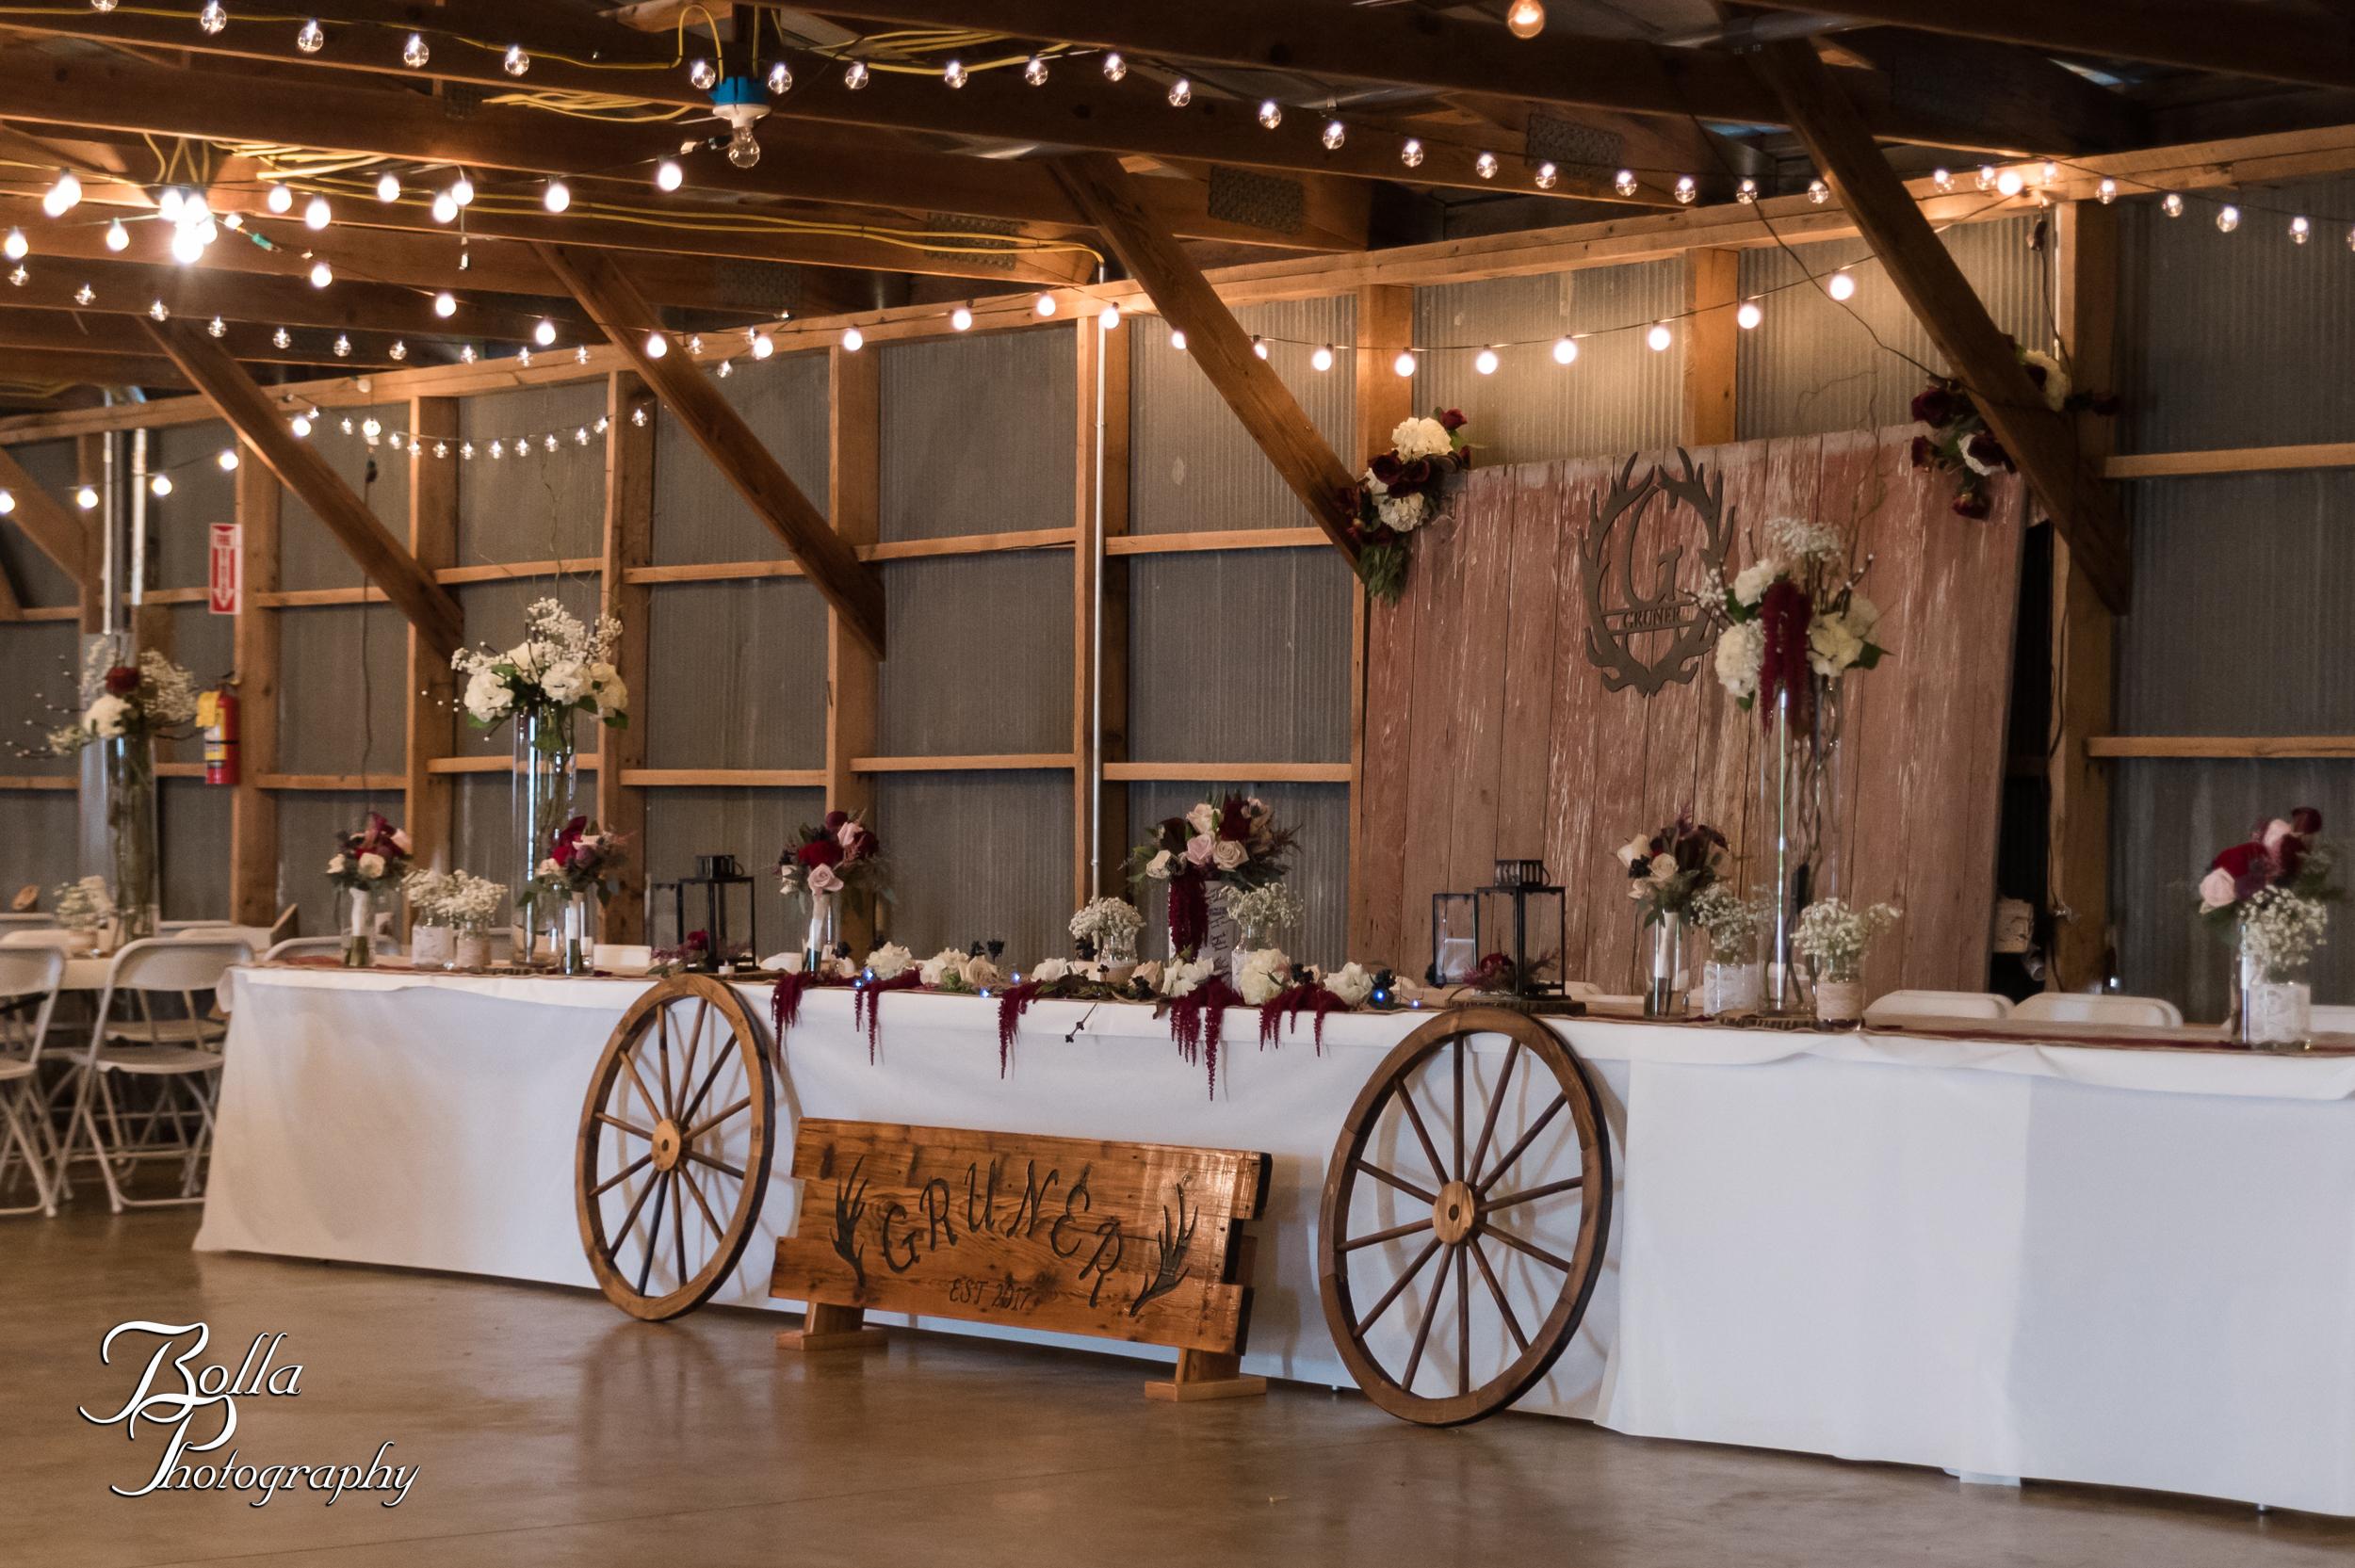 Bolla_photography_edwardsville_wedding_photographer_st_louis_weddings_Amber_Korsmeyer_Kyle_Gruner_Schwarz_Barn_blue_jeans_pickup_truck_autumn-0358.jpg